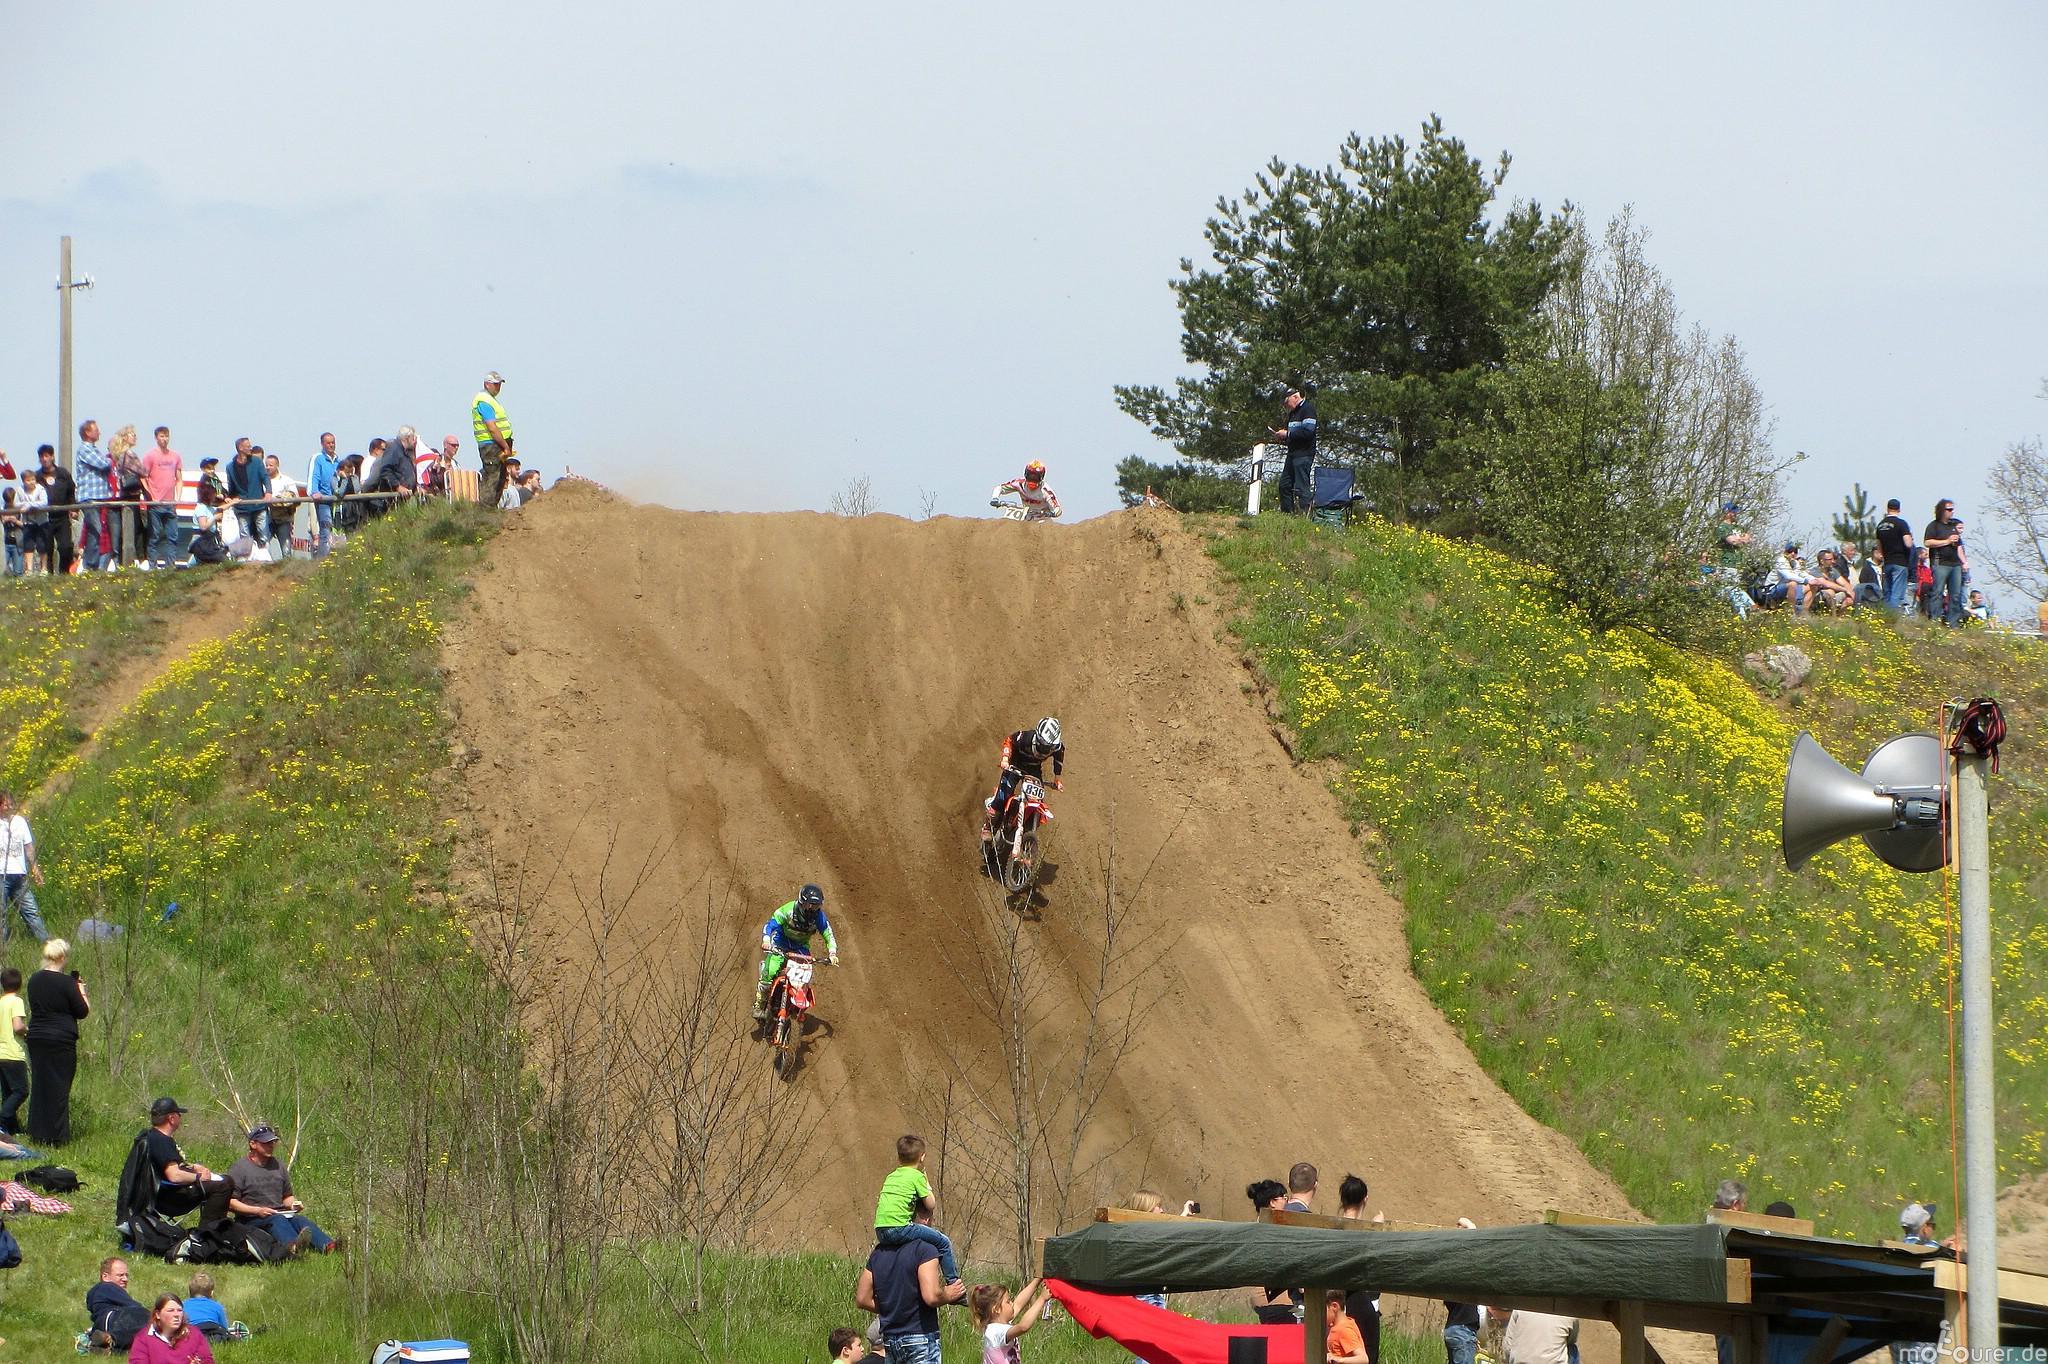 Downhill